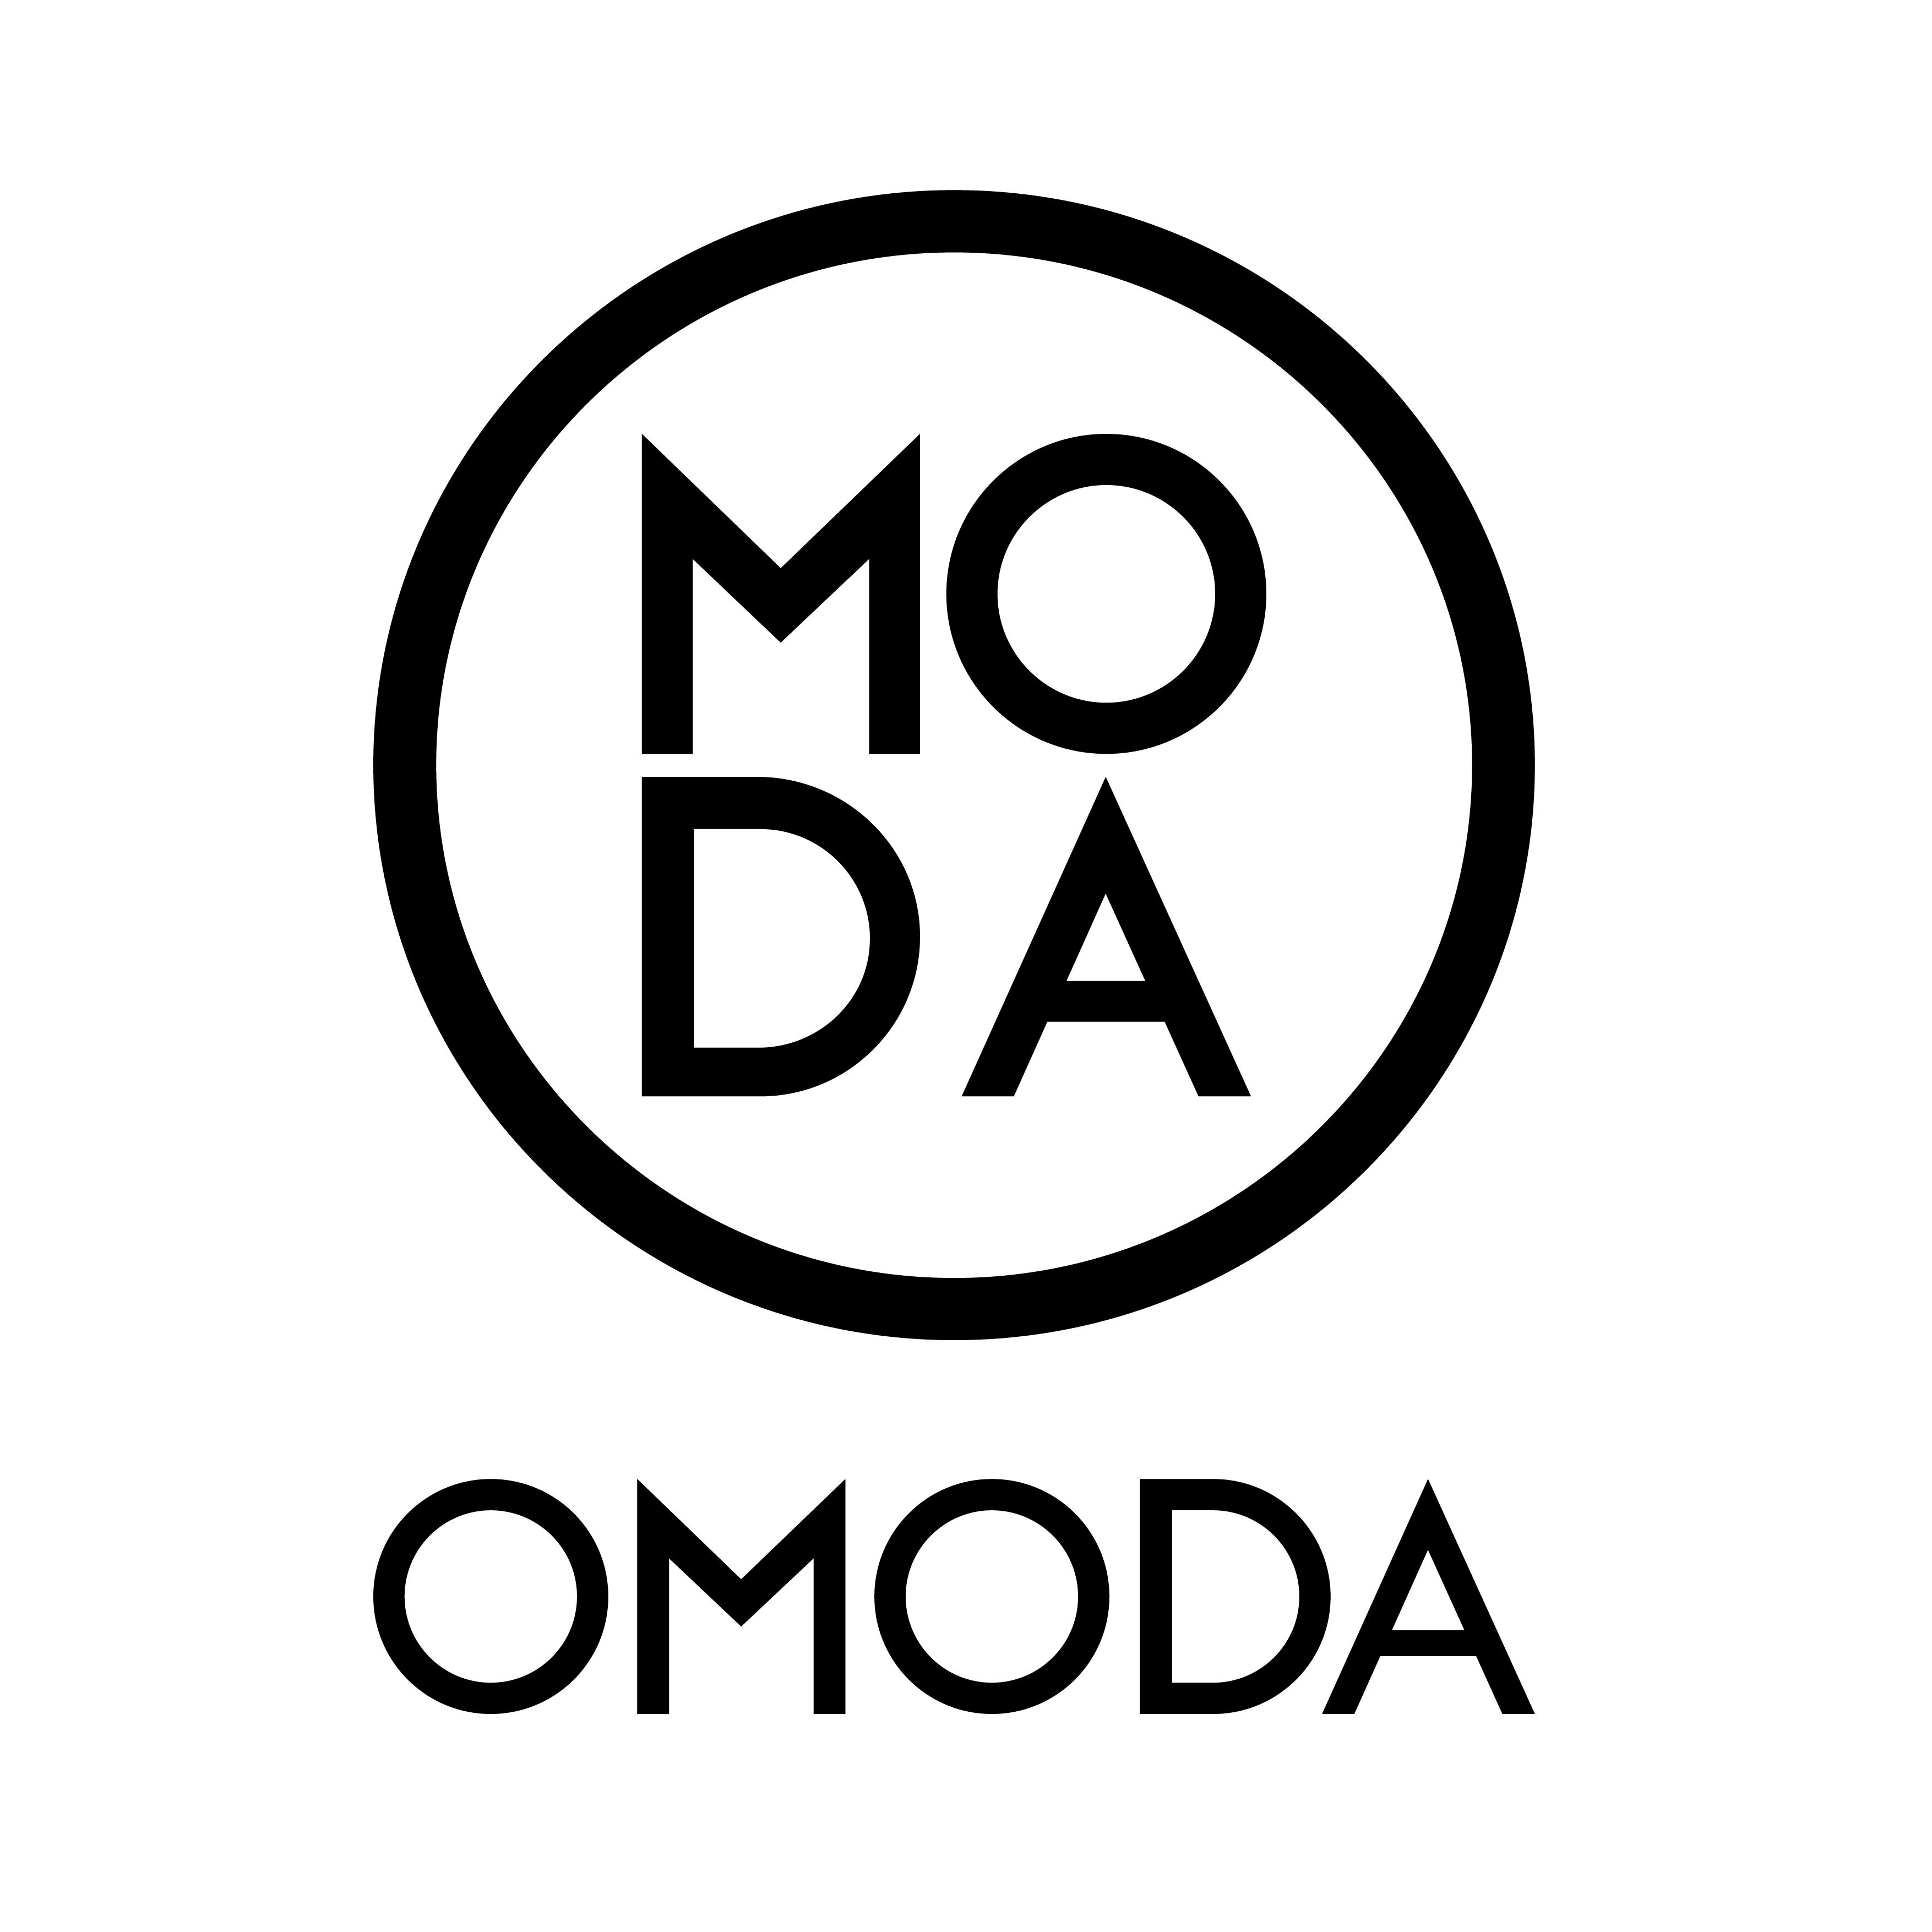 9c9971026a1 Schoenen, tassen en accessoires online bestellen - Omoda.nl